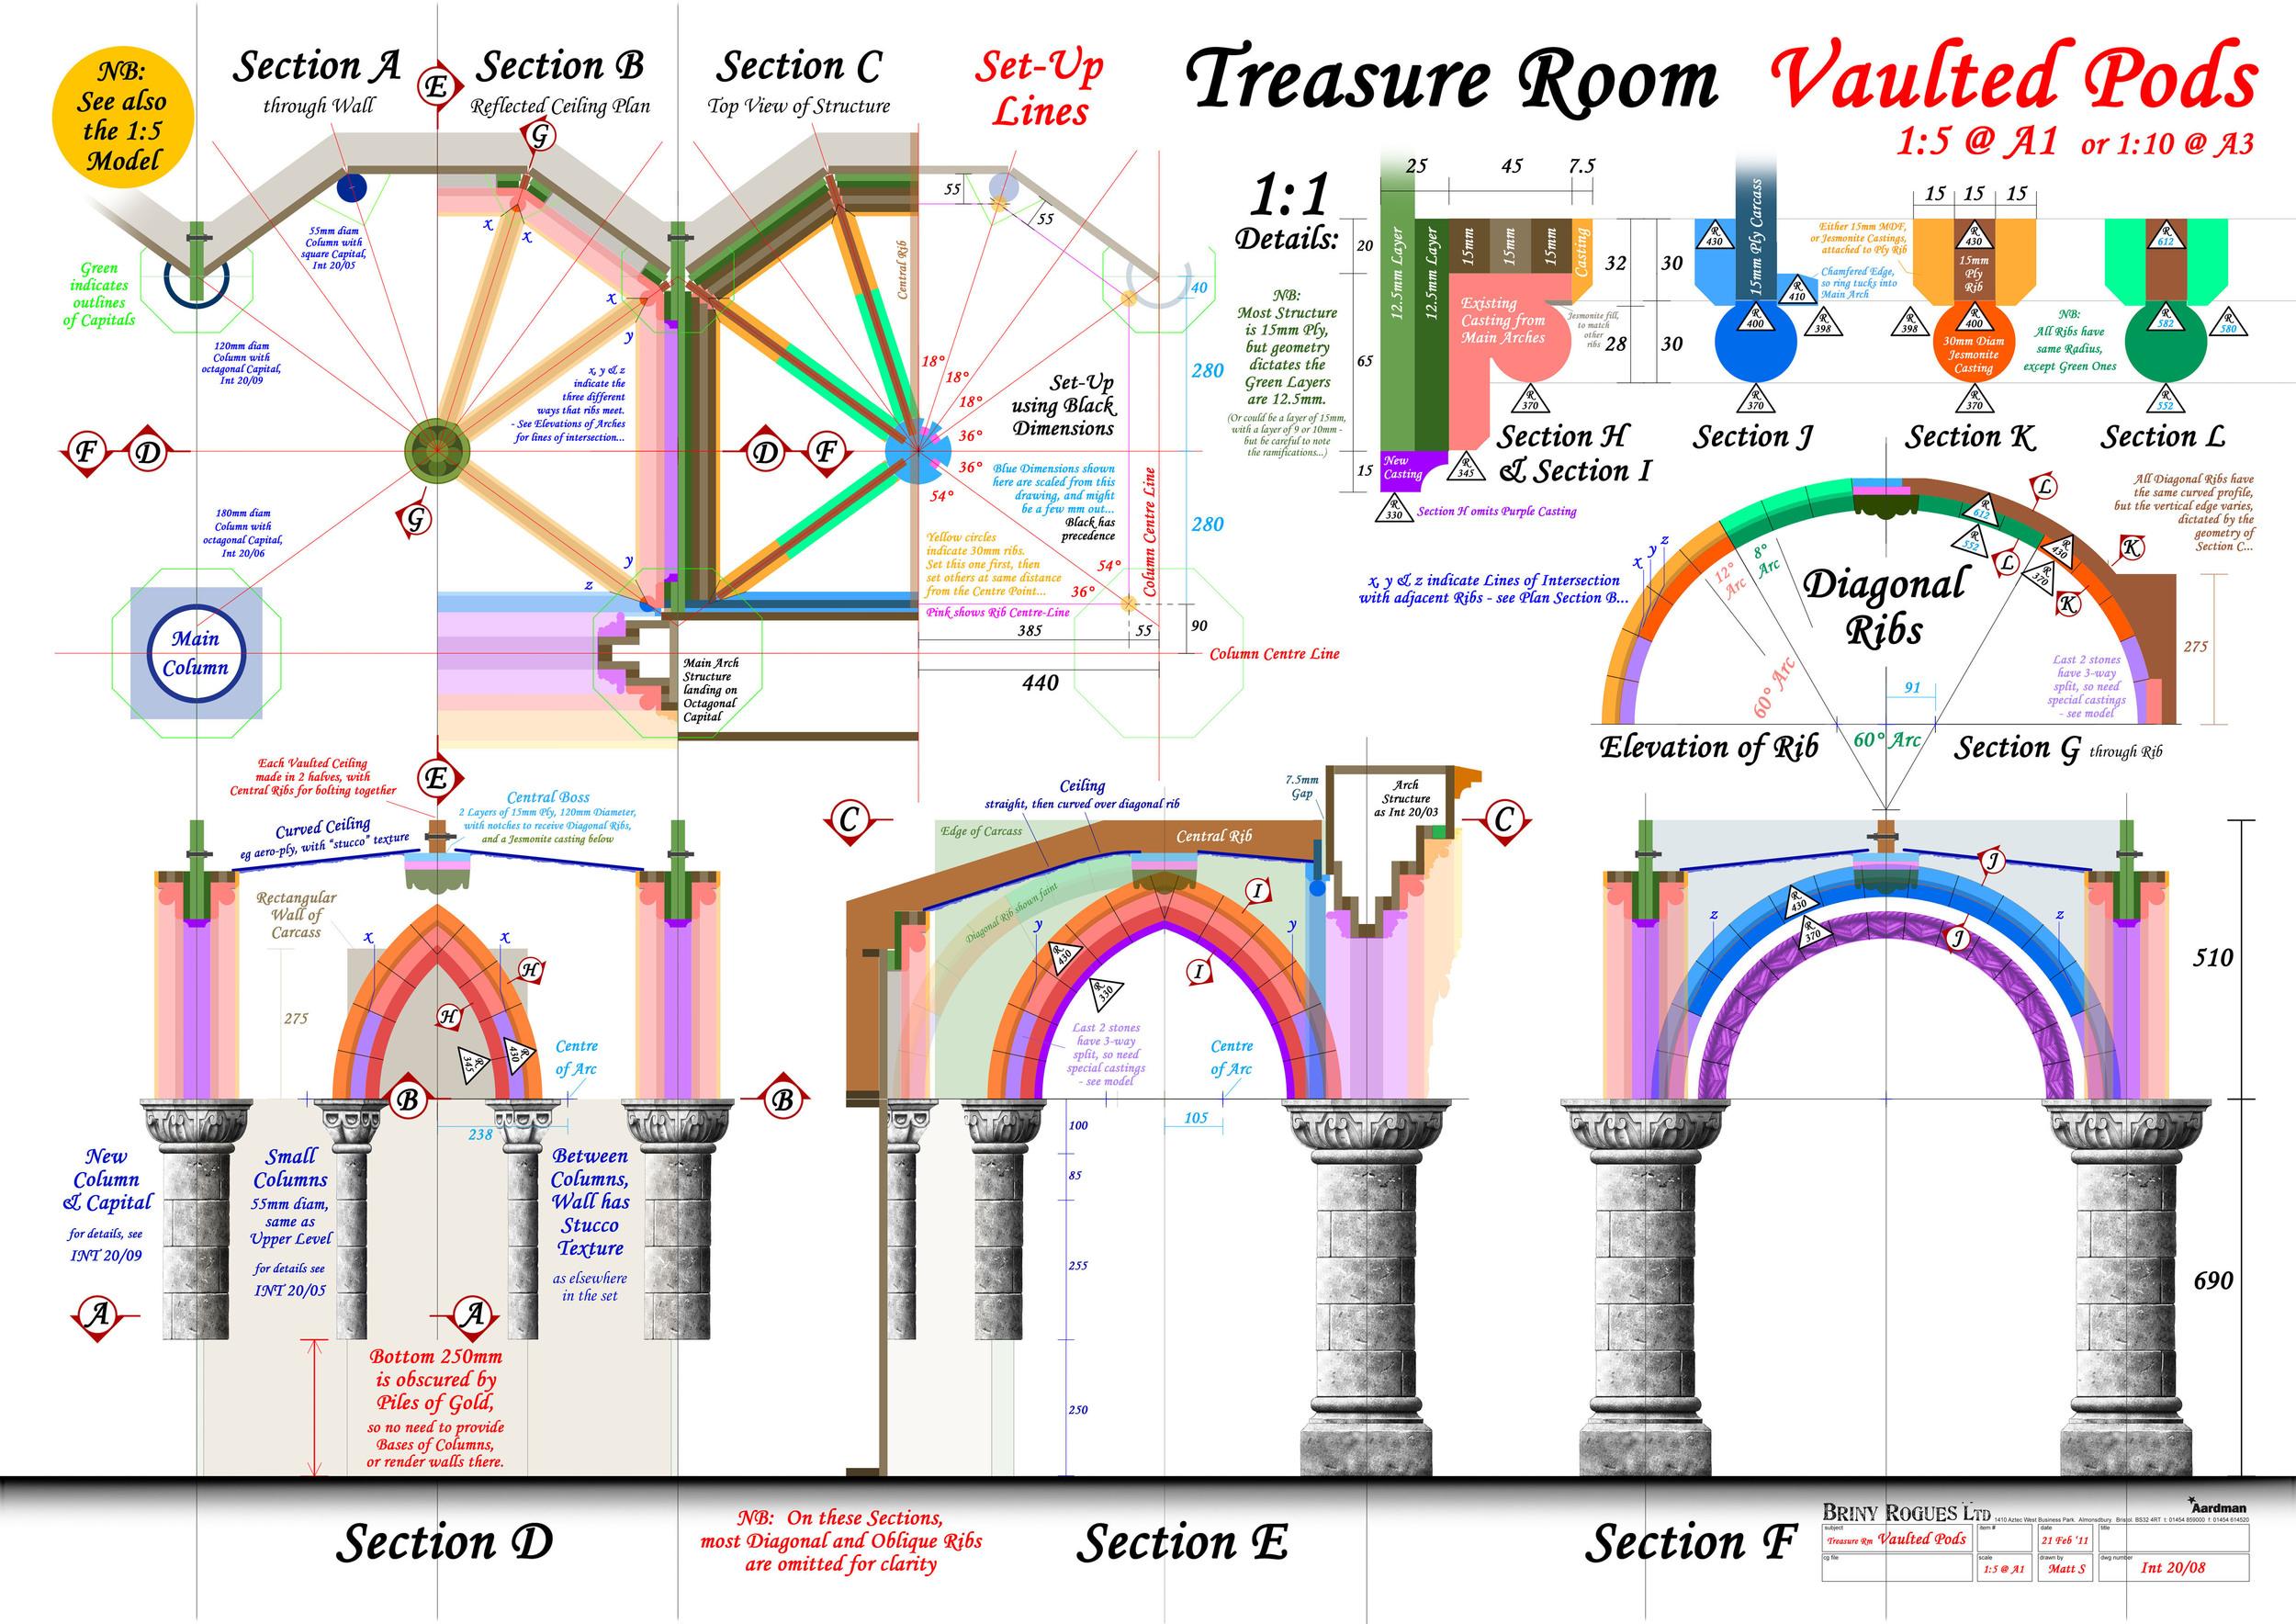 INT 20-08 Vaulted Pods.jpg